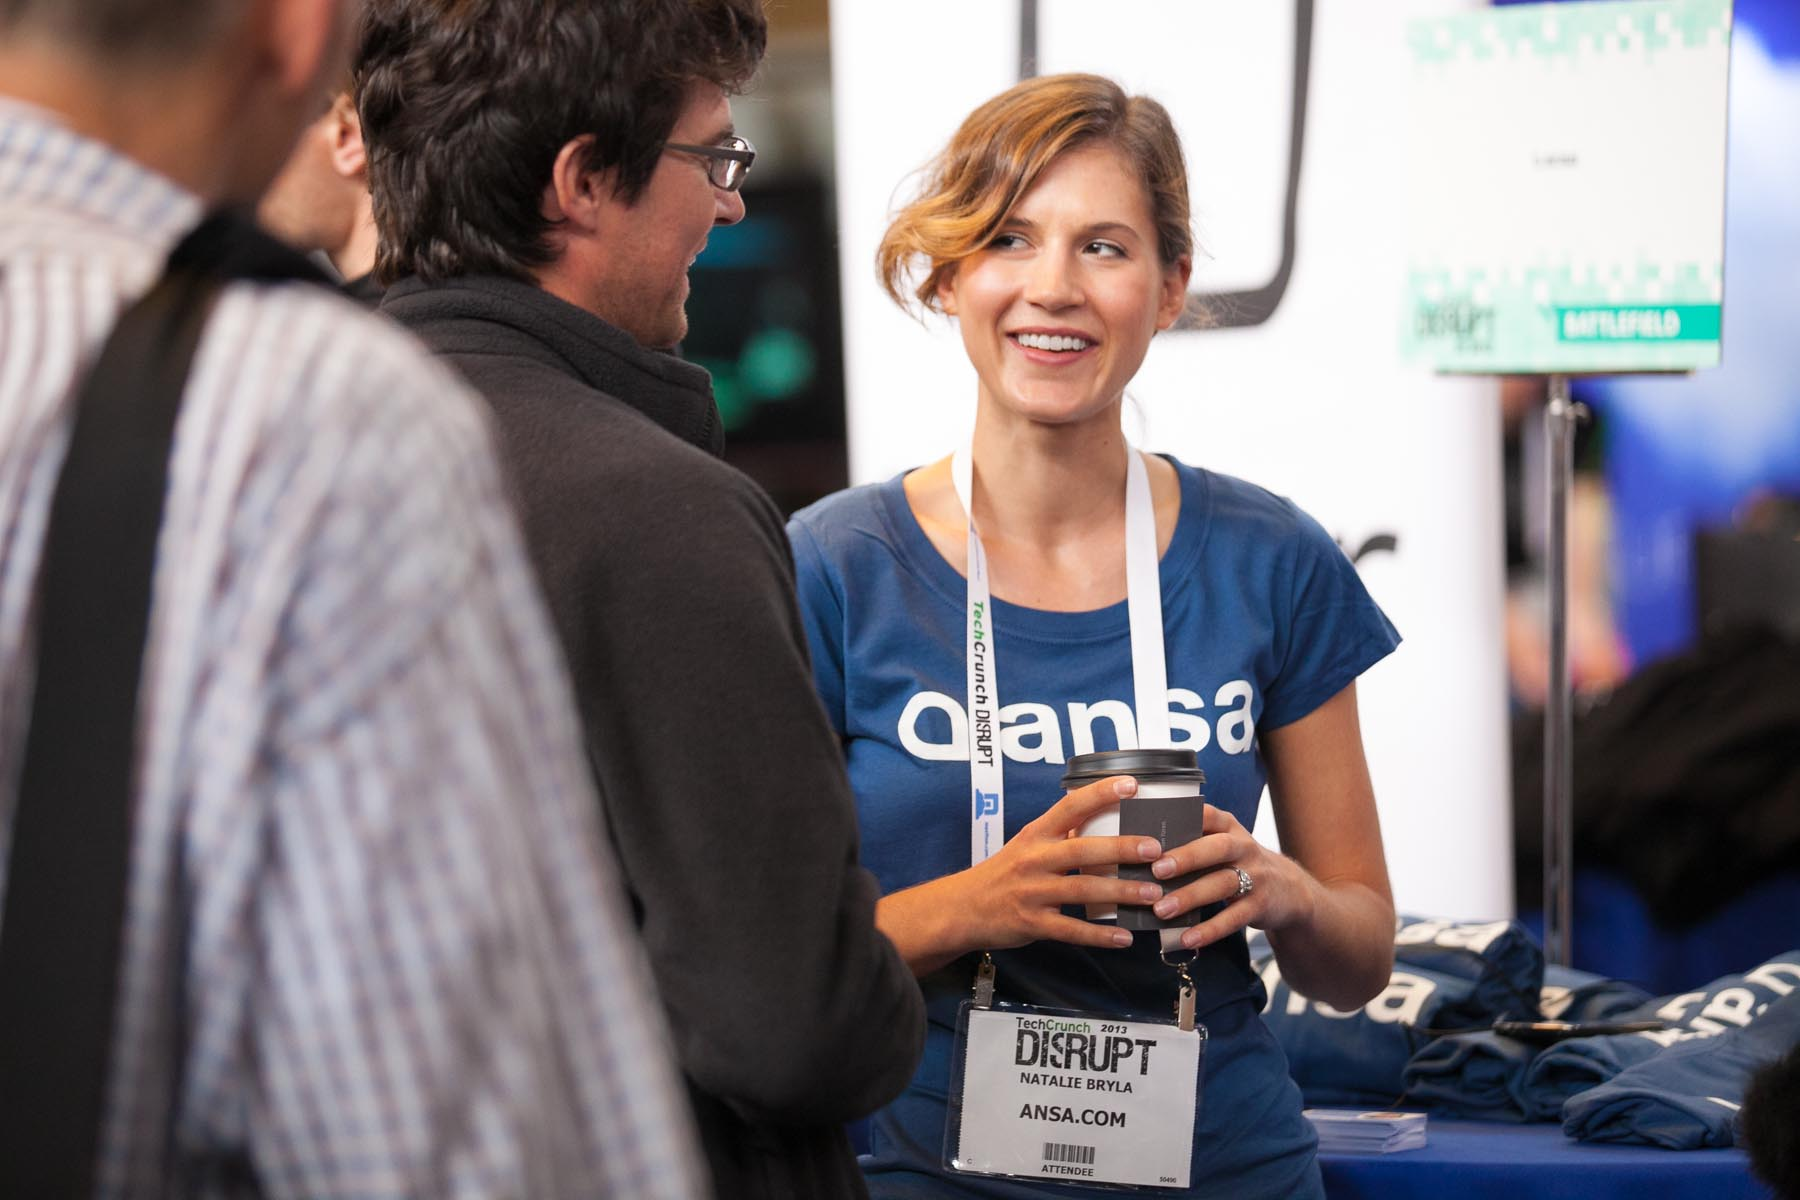 Natalie Bryla, Ansa founder